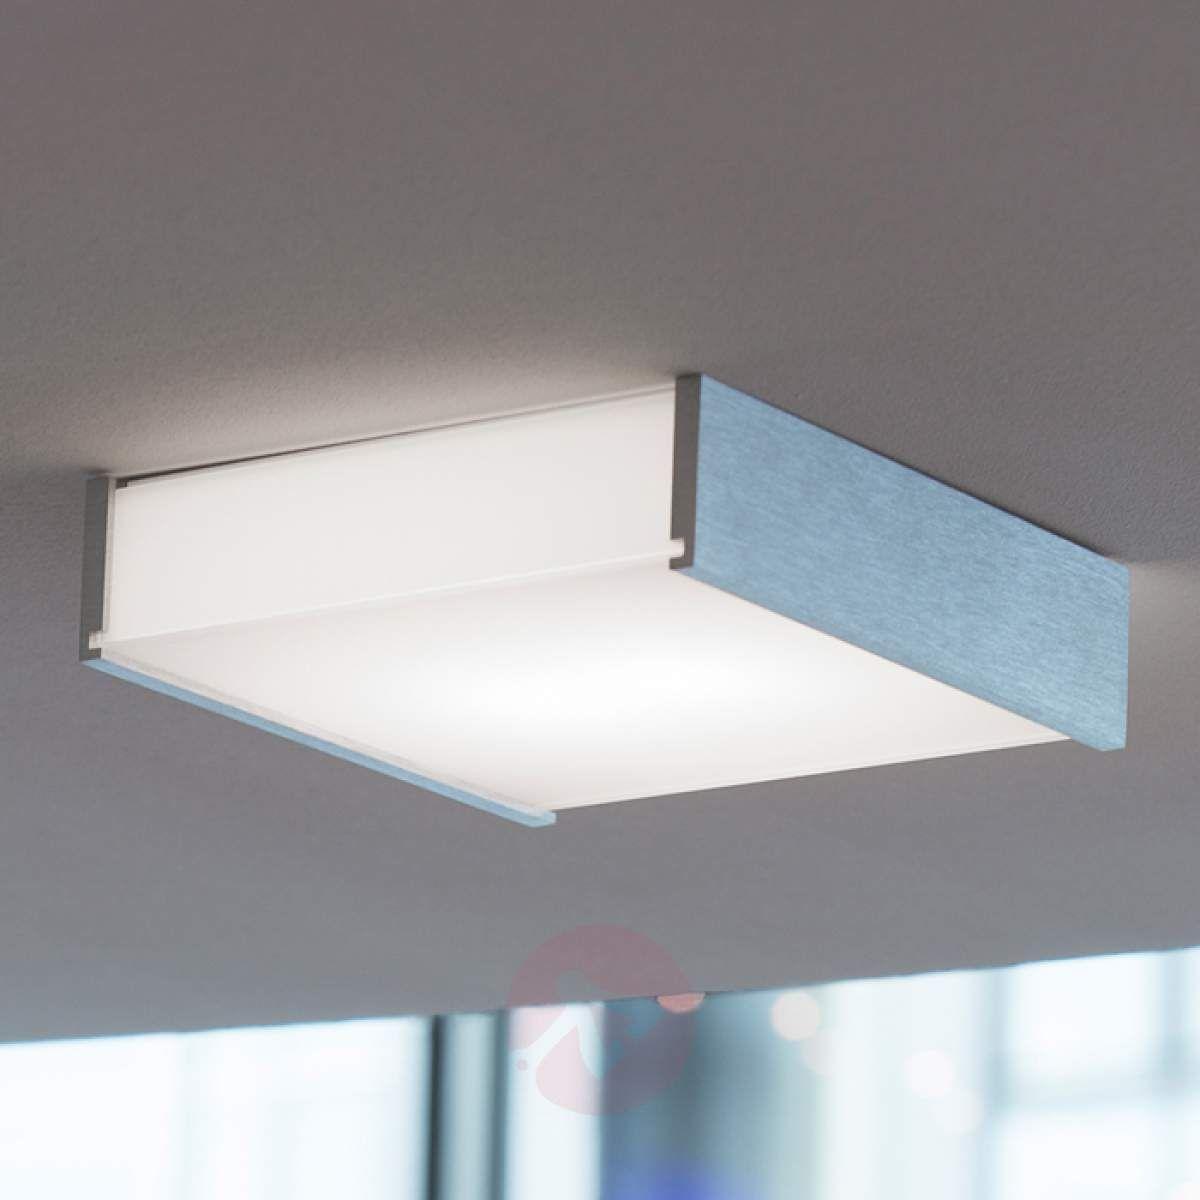 długie lampy led boxy